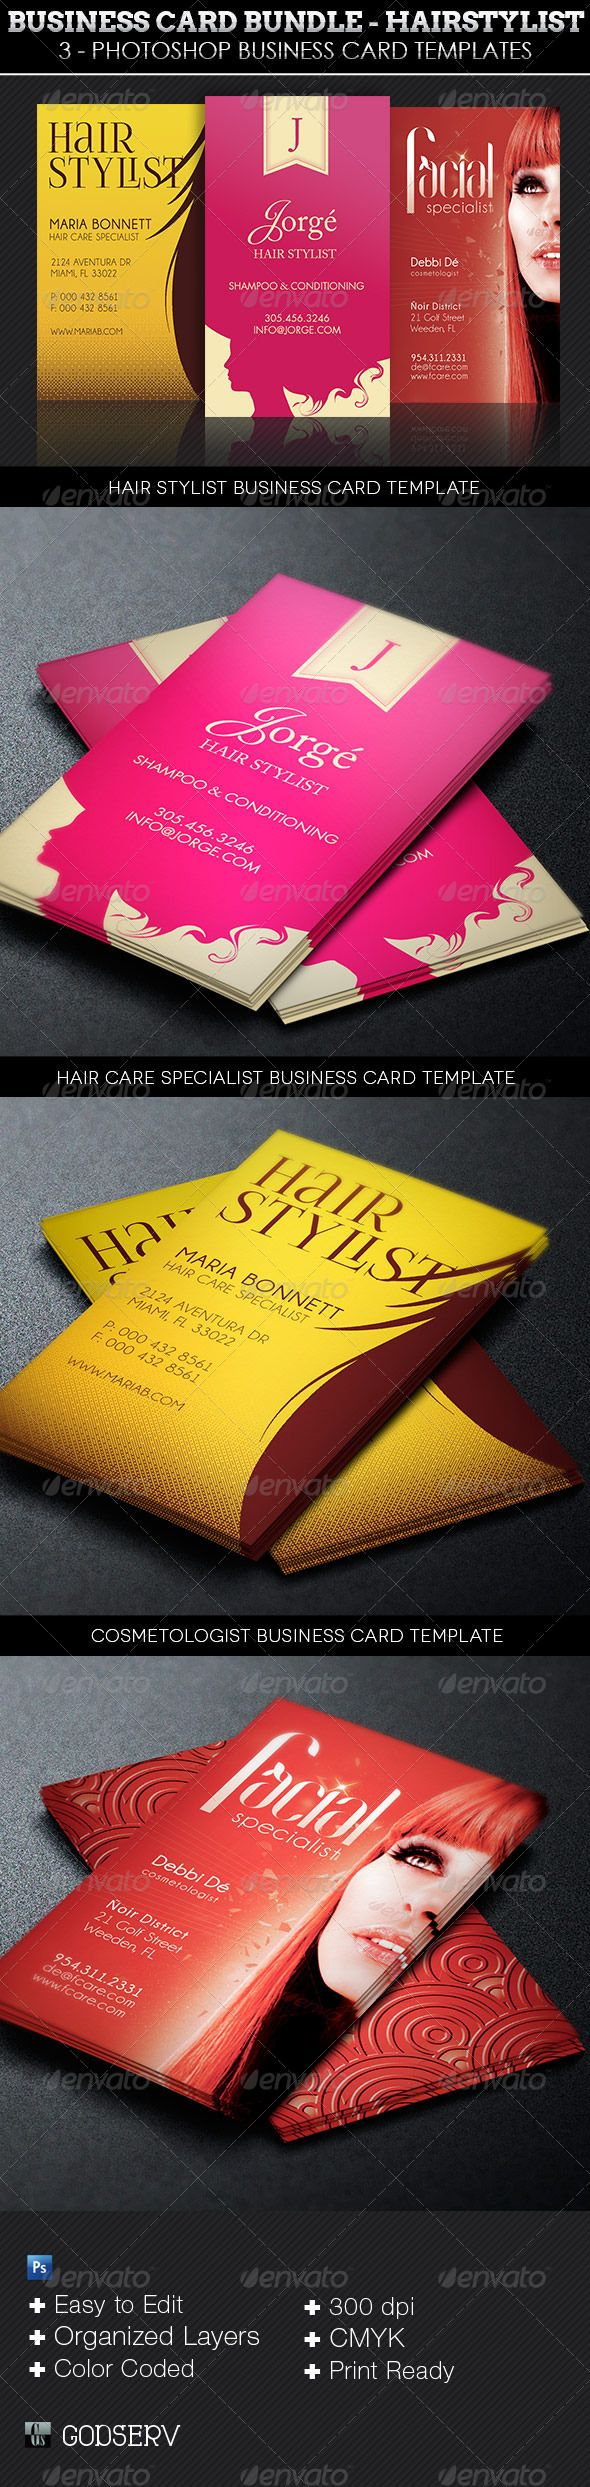 Hair Stylist Business Card Template Bundle Is For Modern Hair